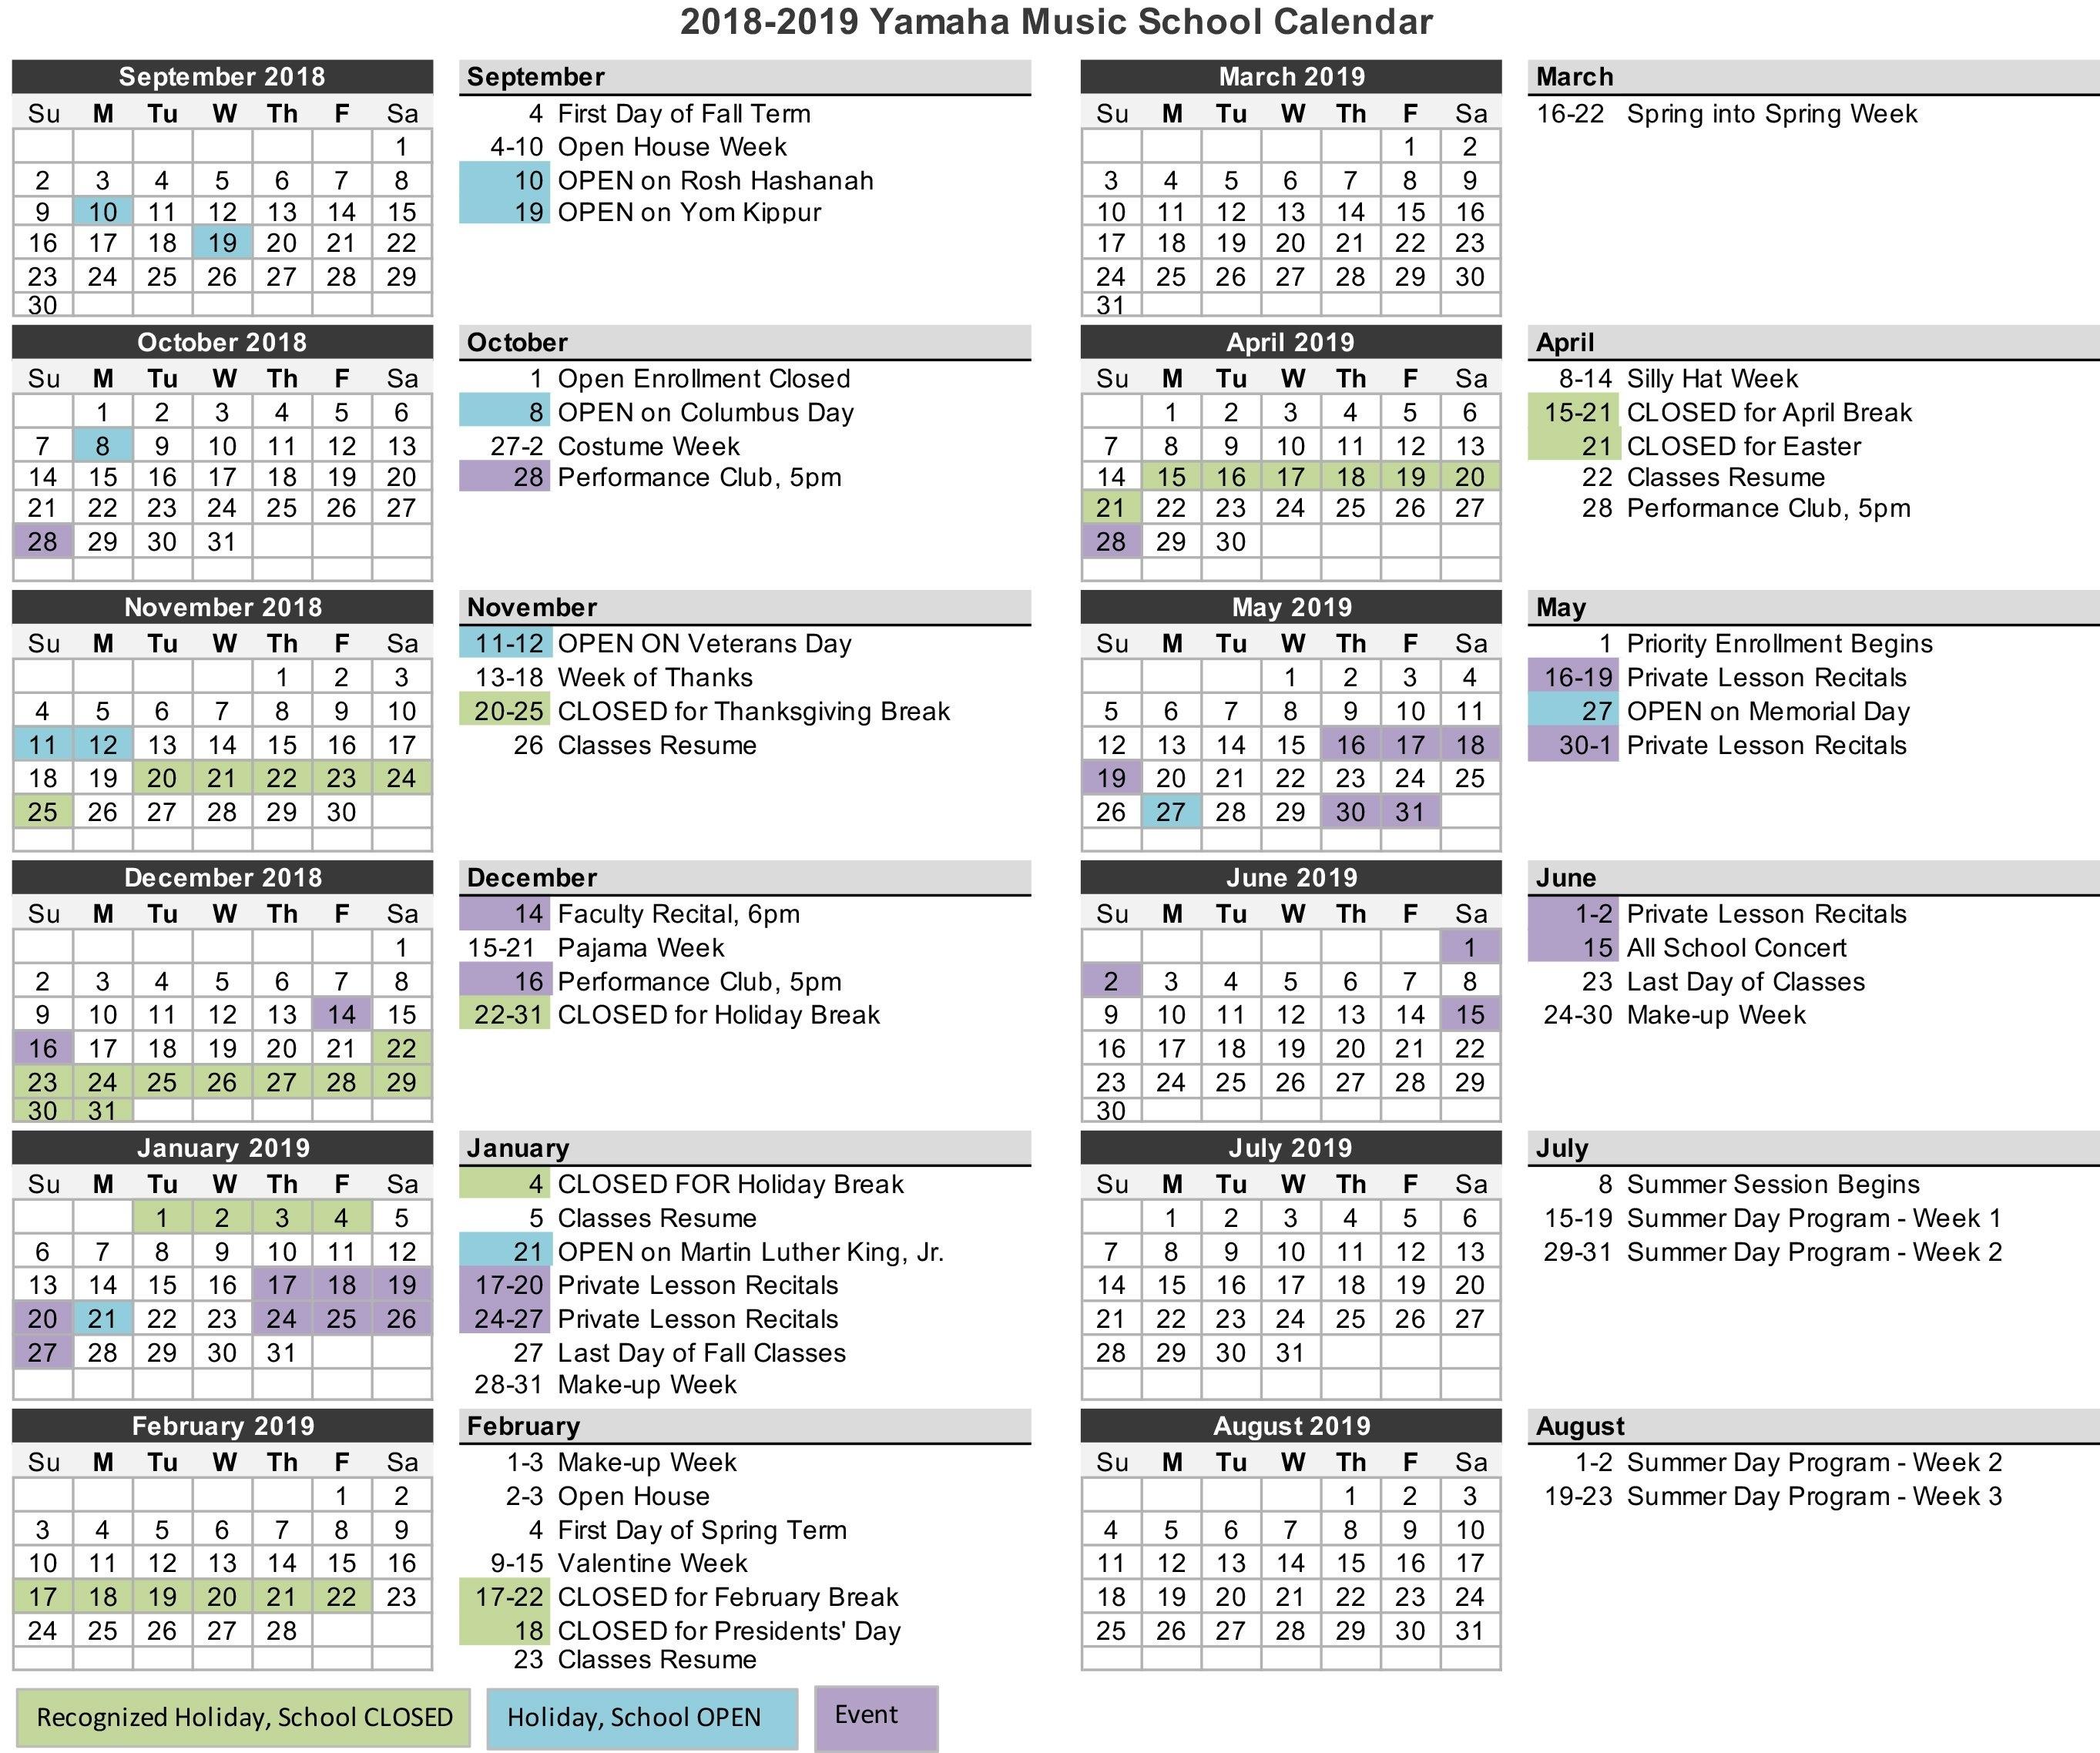 School Calendar | Yamaha Music School School Calendar Lexington Ma